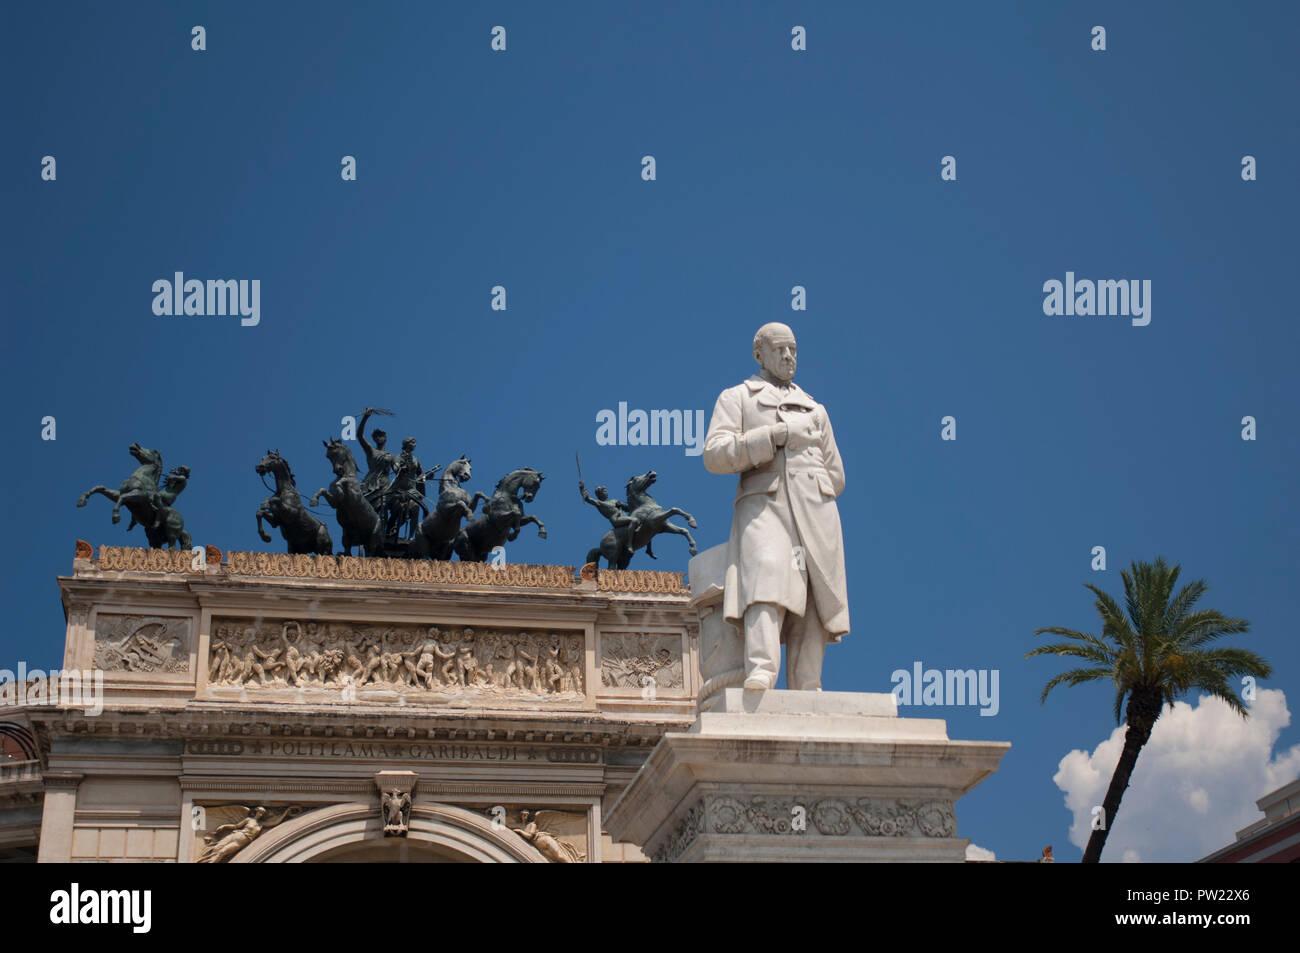 Bronze horses of a quadriga on top of the portico of the Teatro Politeama Garibaldi, with a statue of Ruggero Settimo in the foreground Stock Photo